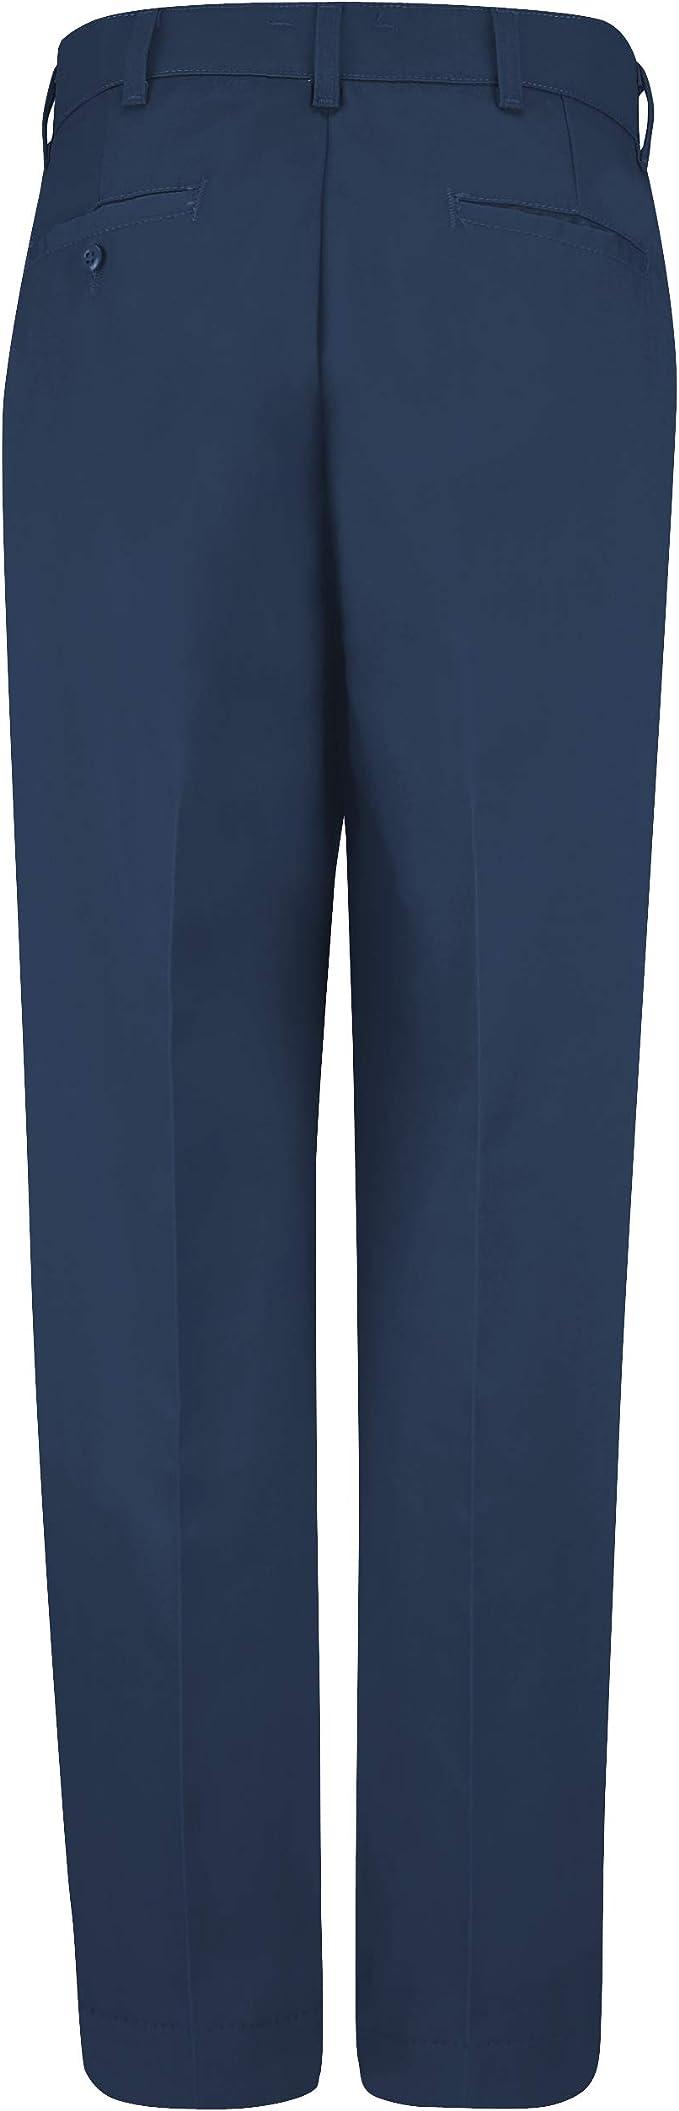 Amazon Com Red Kap Men S Stain Resistant Flat Front Work Pants Clothing